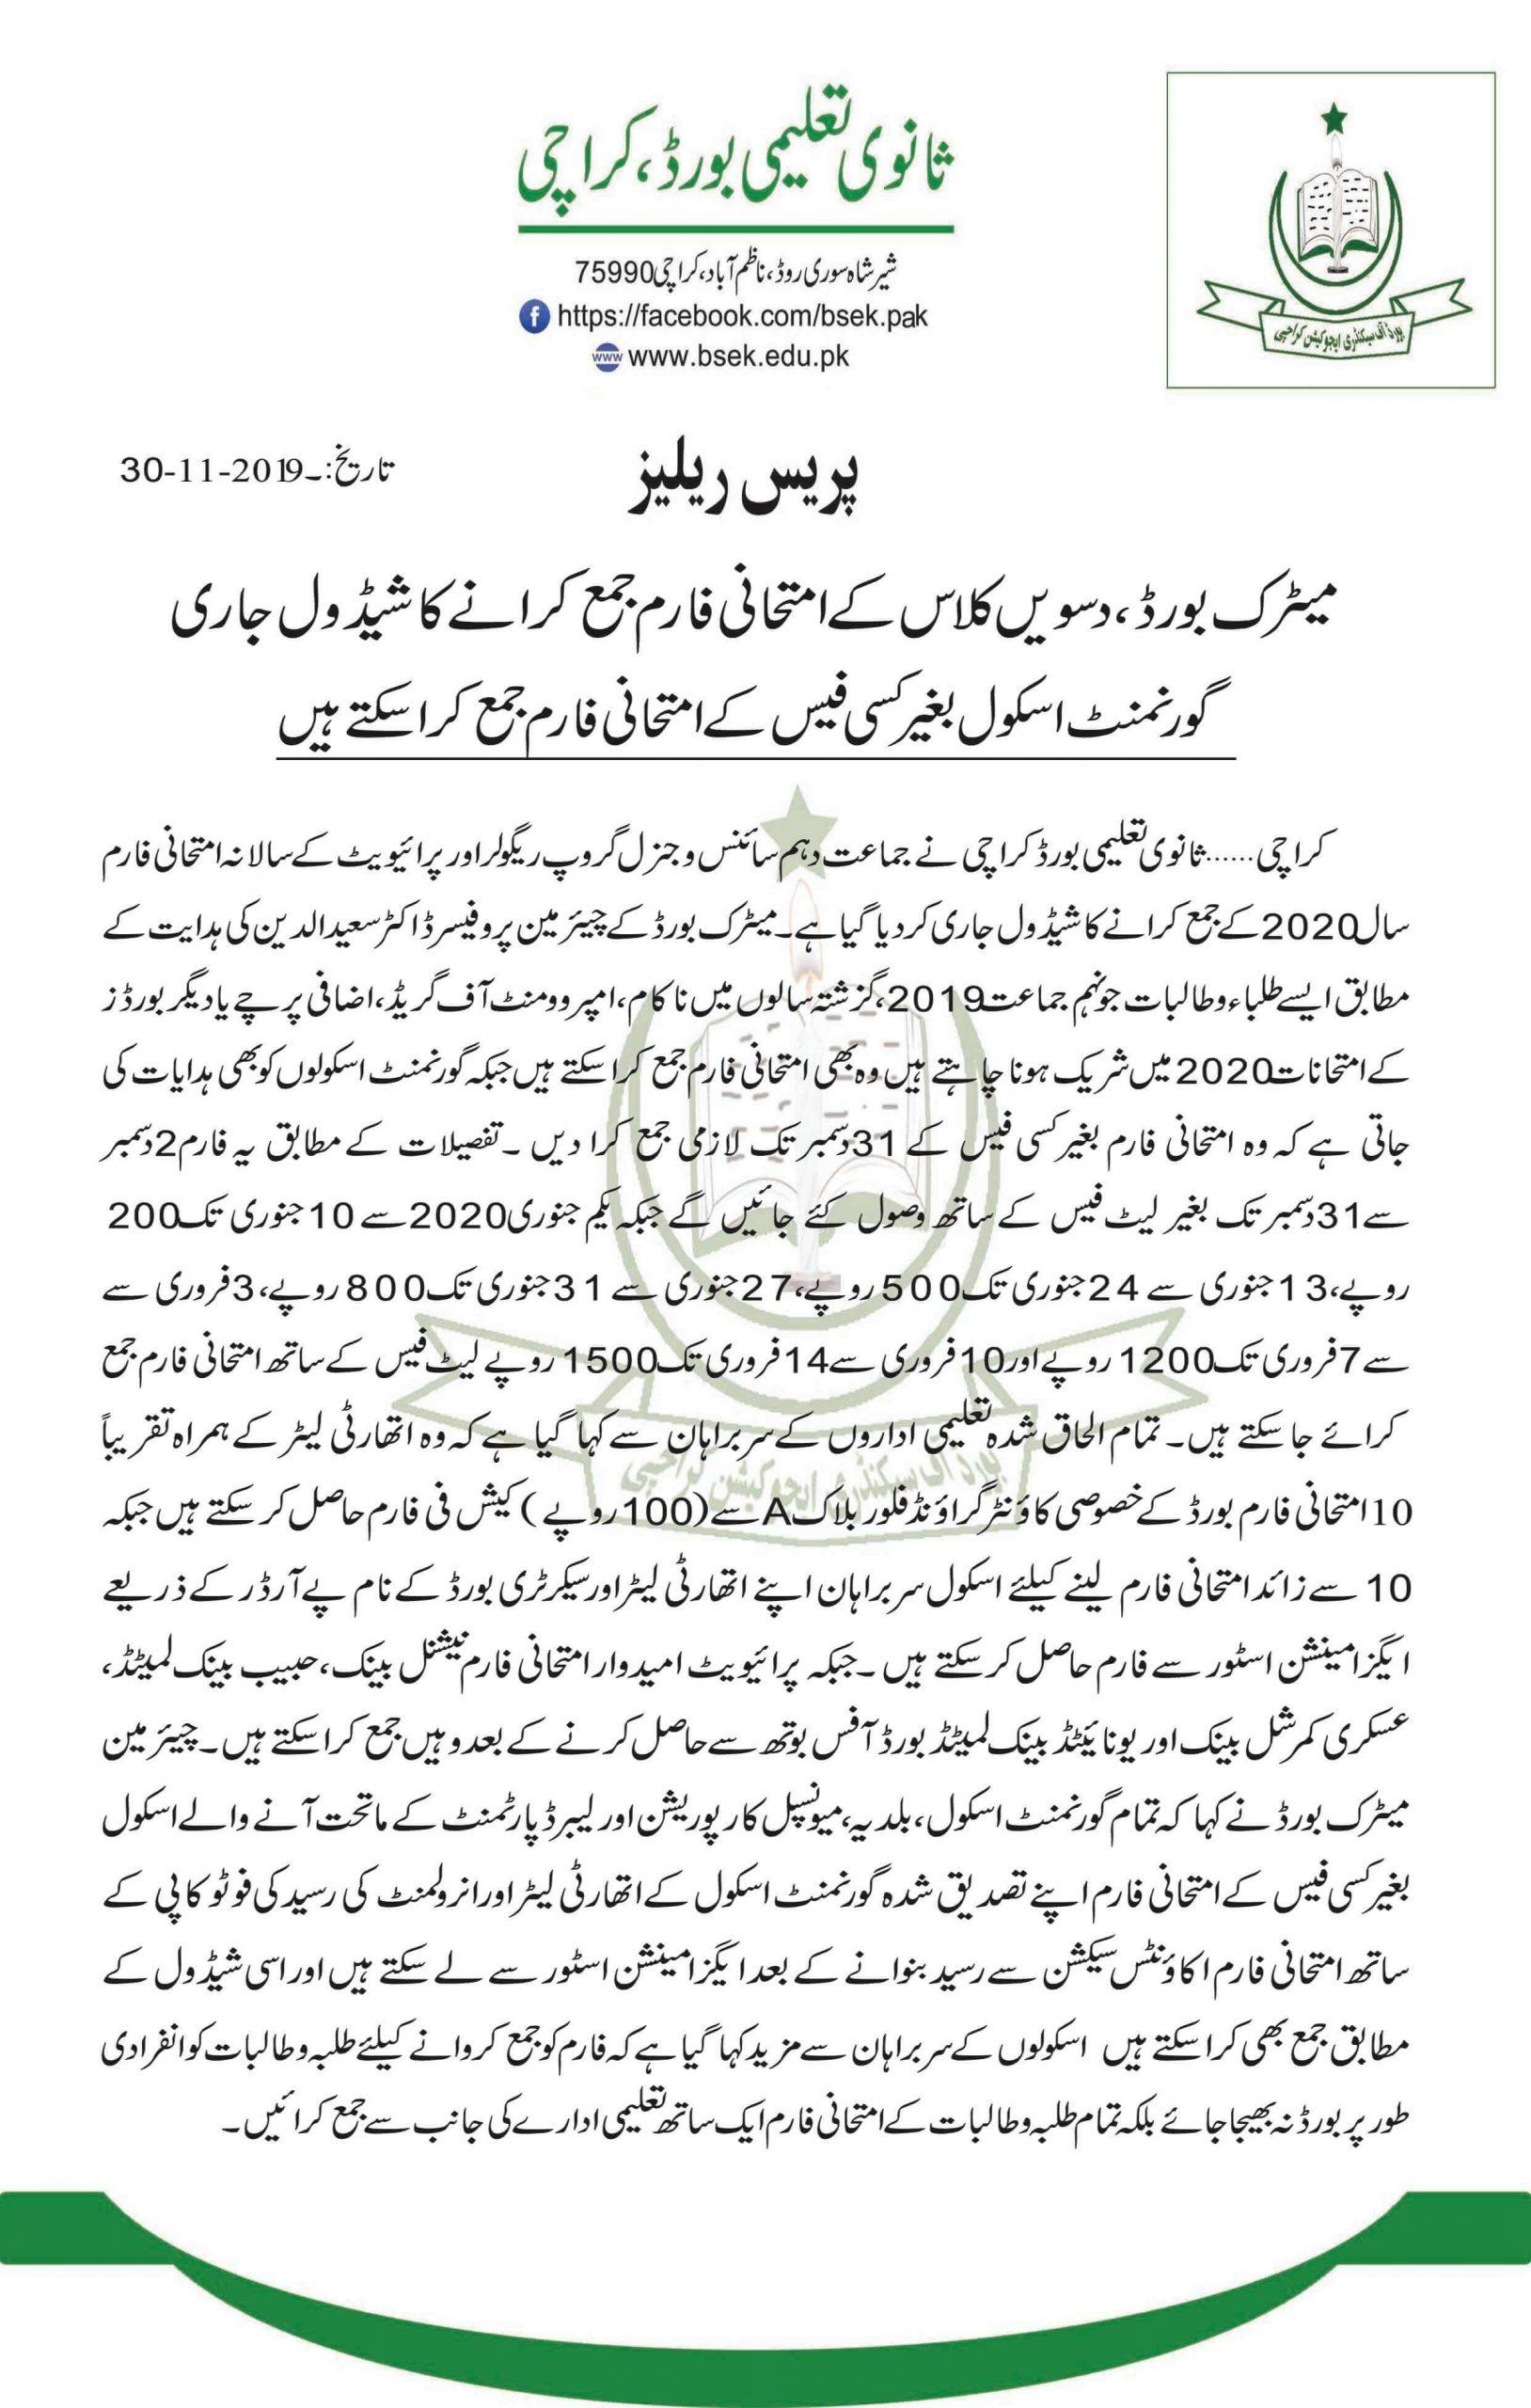 Karachi Matric Board (BSEK) Has Announced The Examination Form Schedule 2020